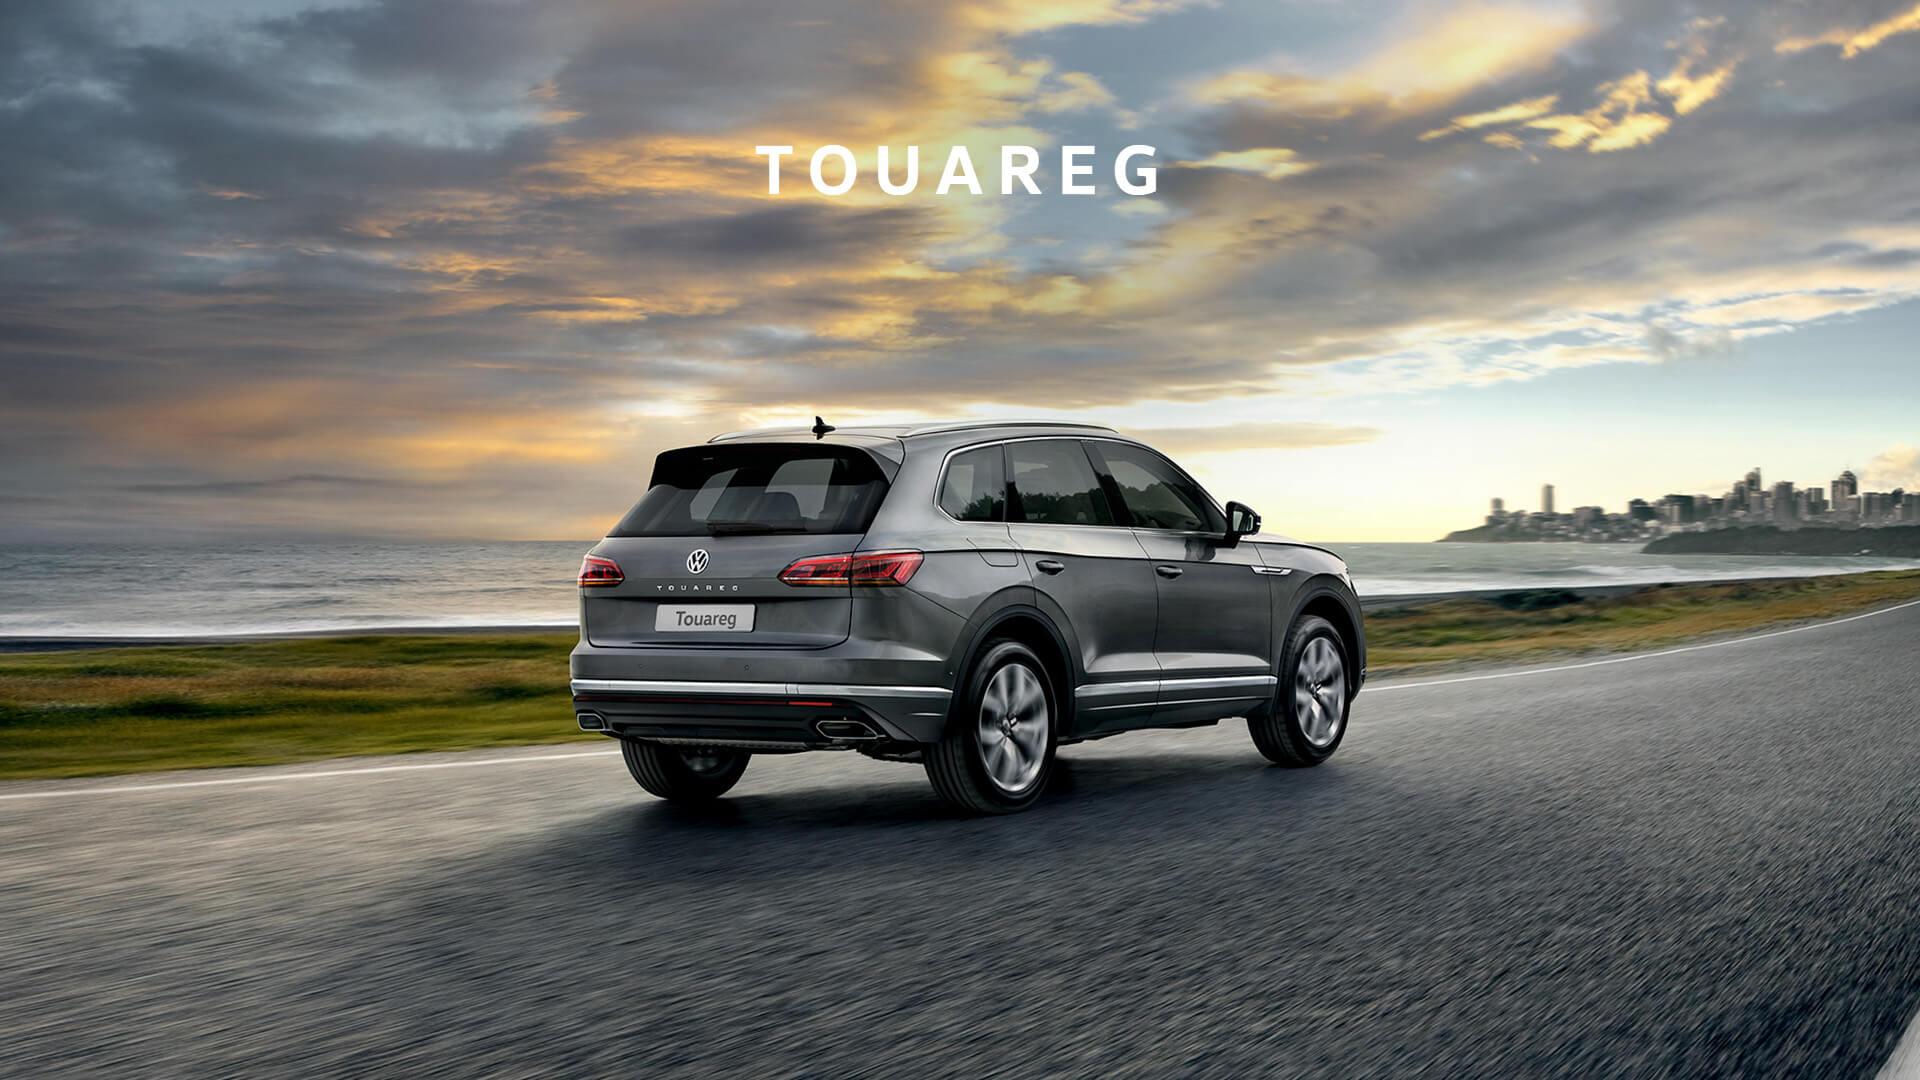 Touareg Image